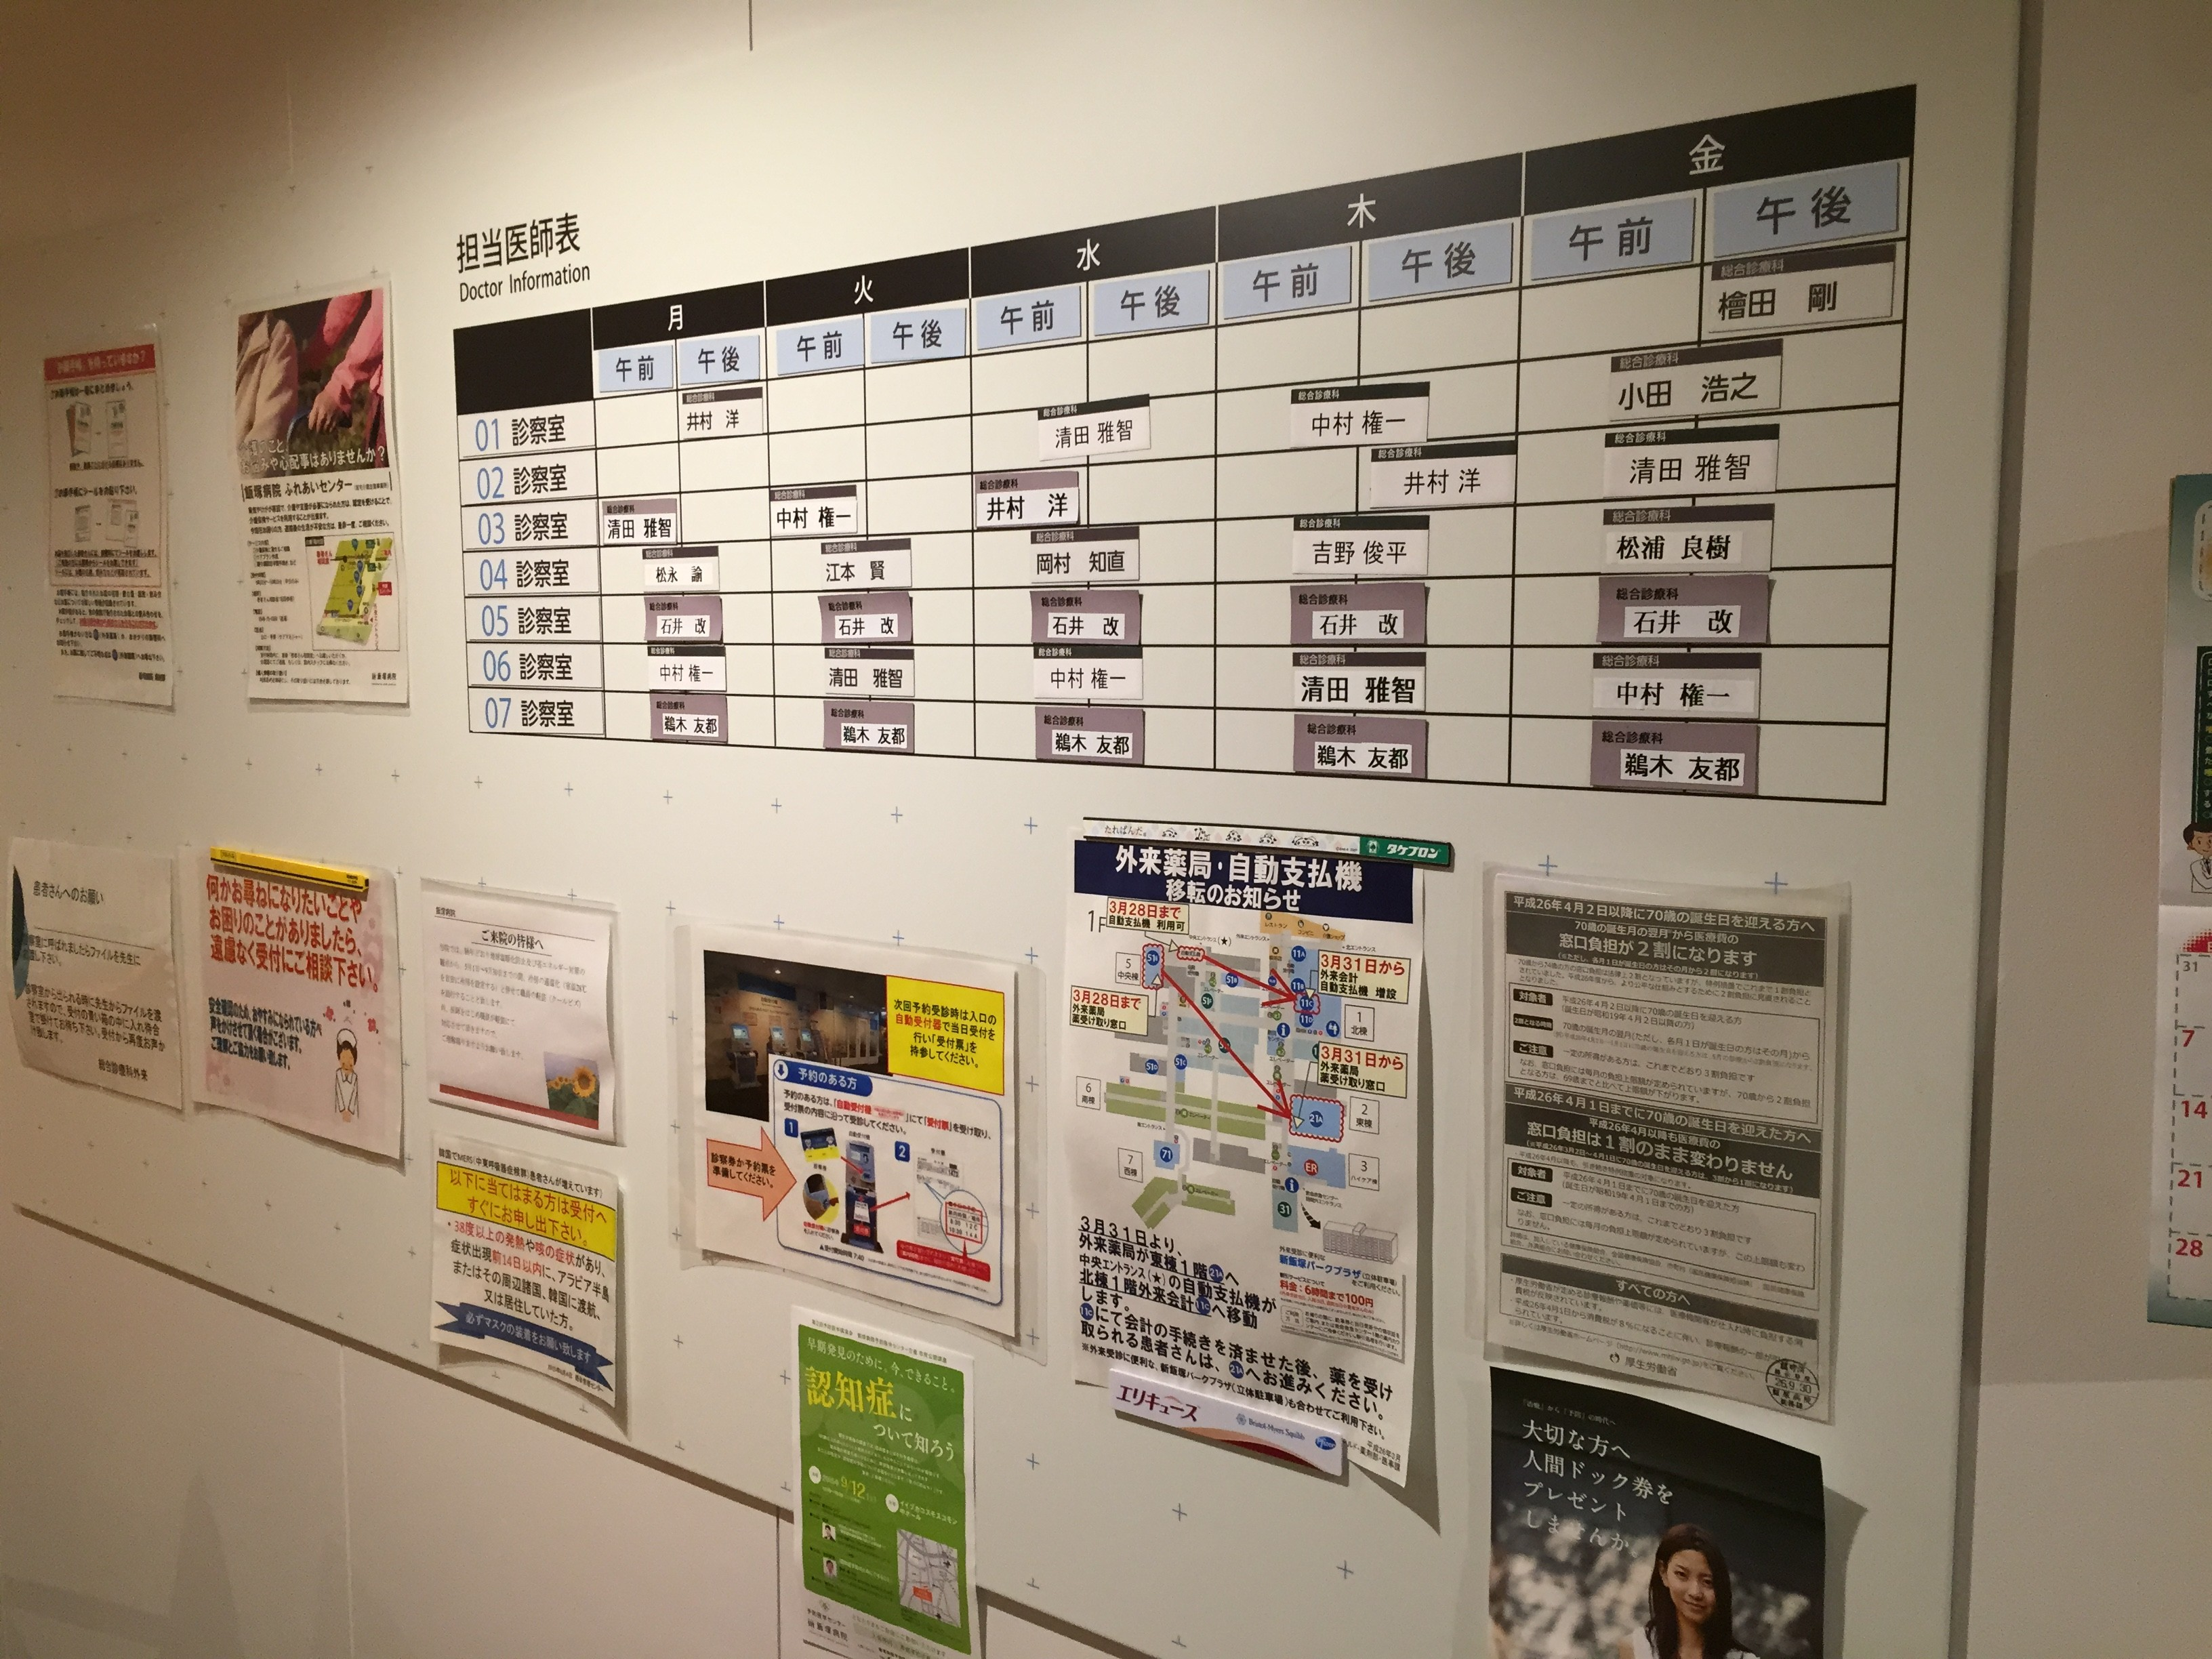 Gemba Walk Boards : Japan gemba visit lean in hospitals katie anderson